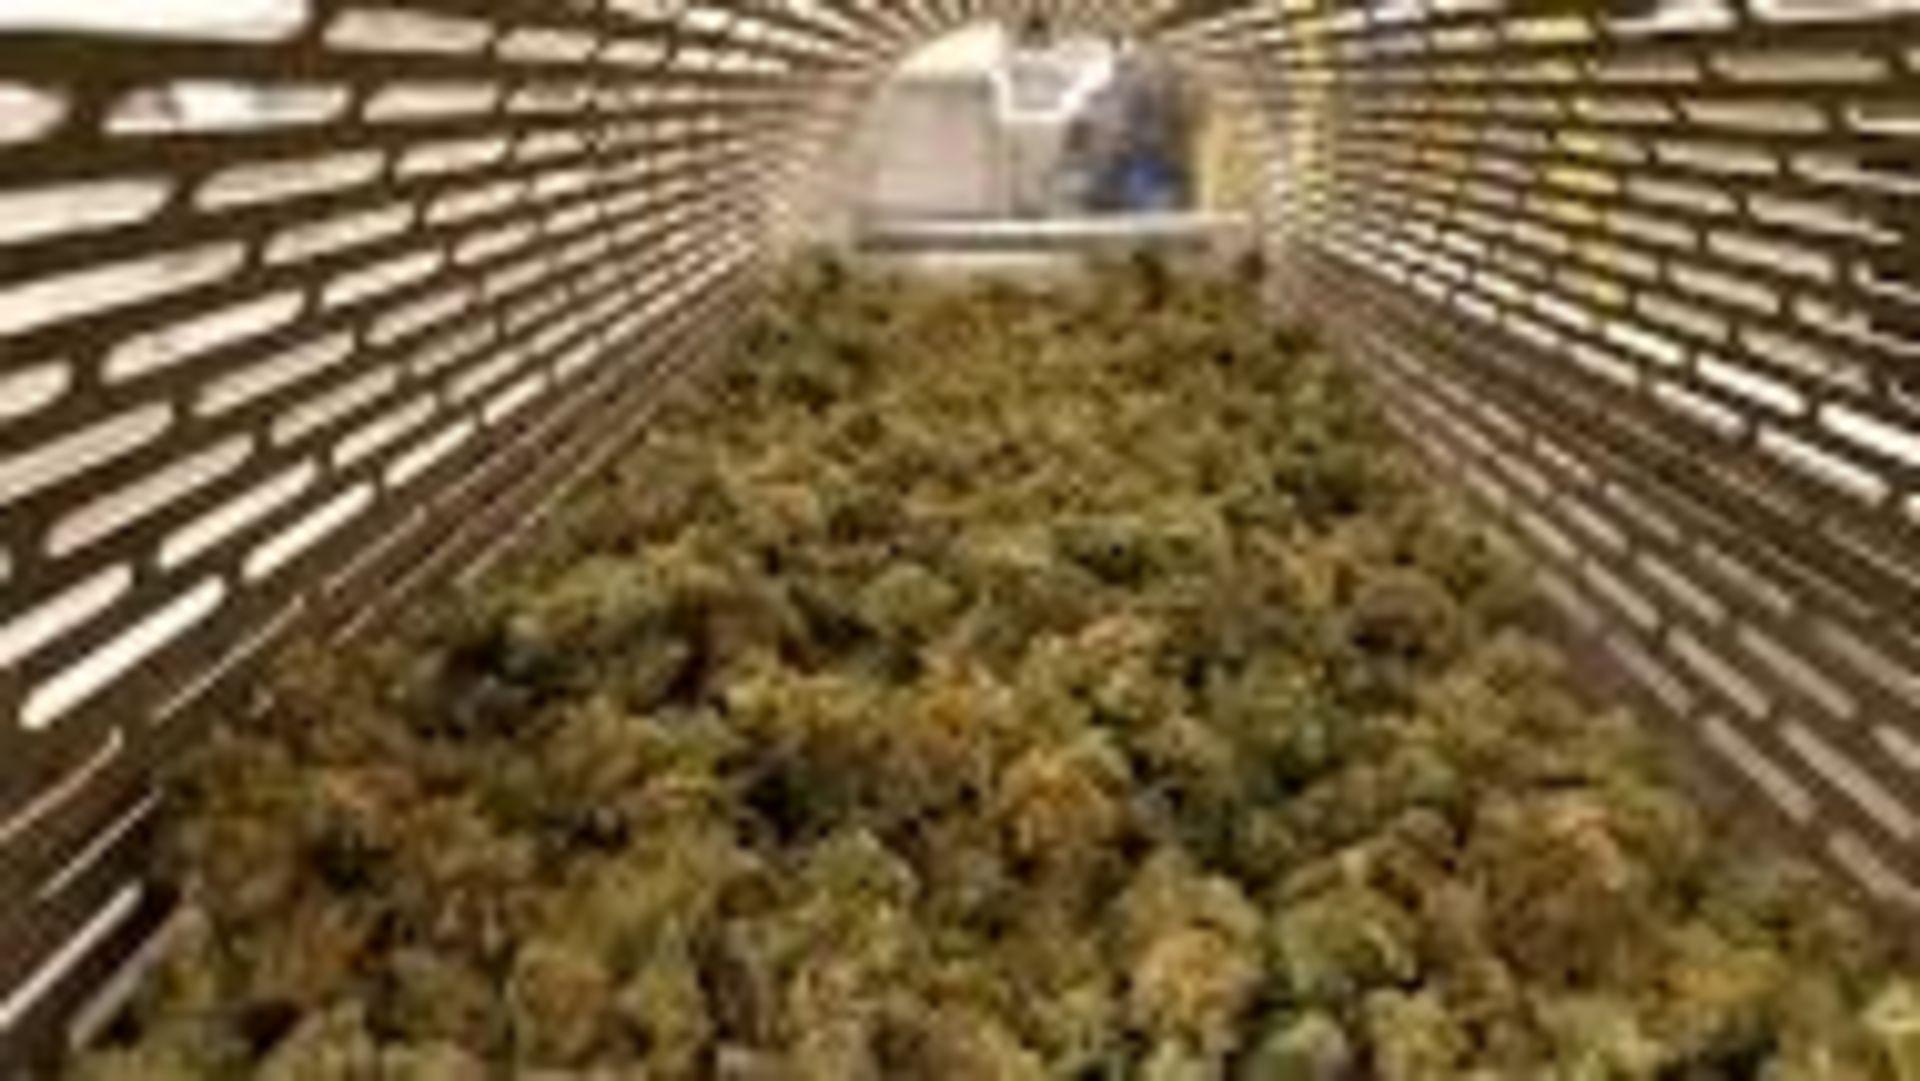 Unused/FactoryNew Revolution Cannabis & Hemp Flower Finisher System Model RDF 4300.100-200 lbs/8 hrs - Image 27 of 32